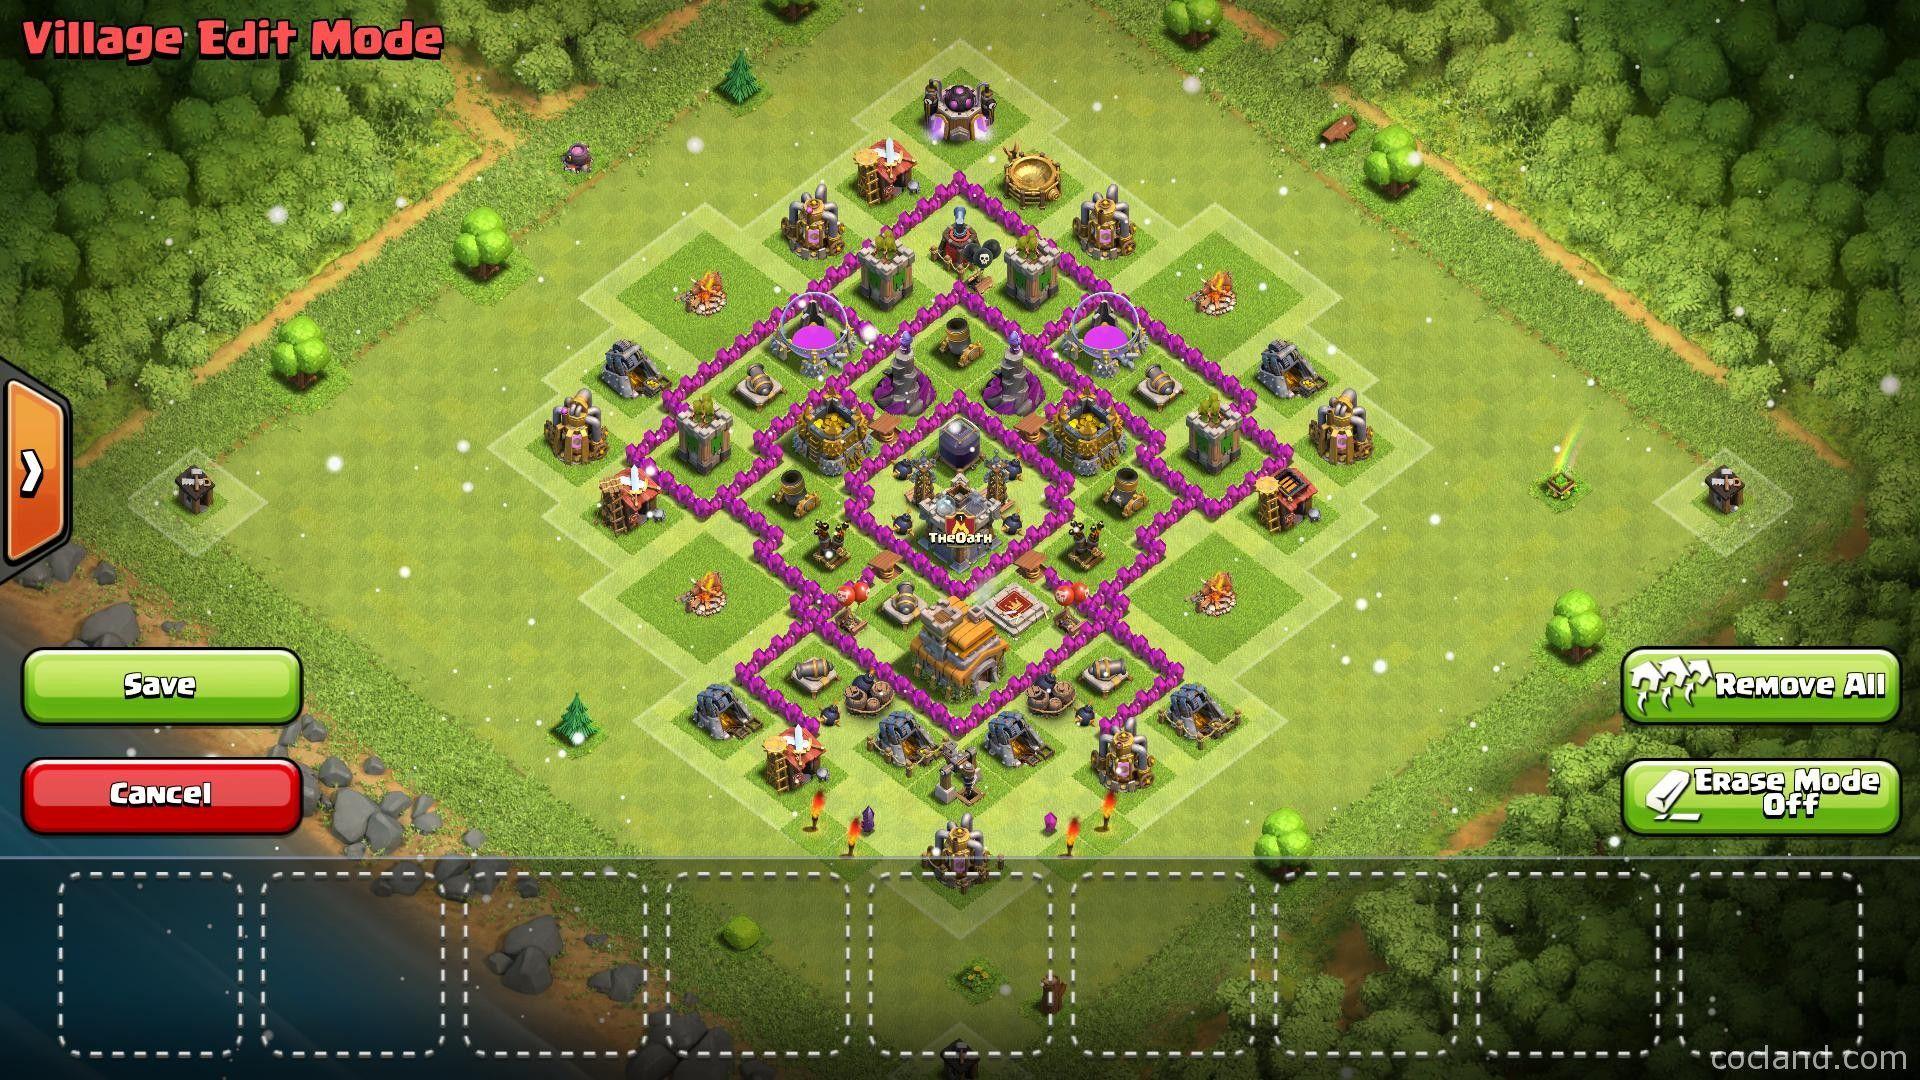 Base Coc Th 7 Paling Kuat 3